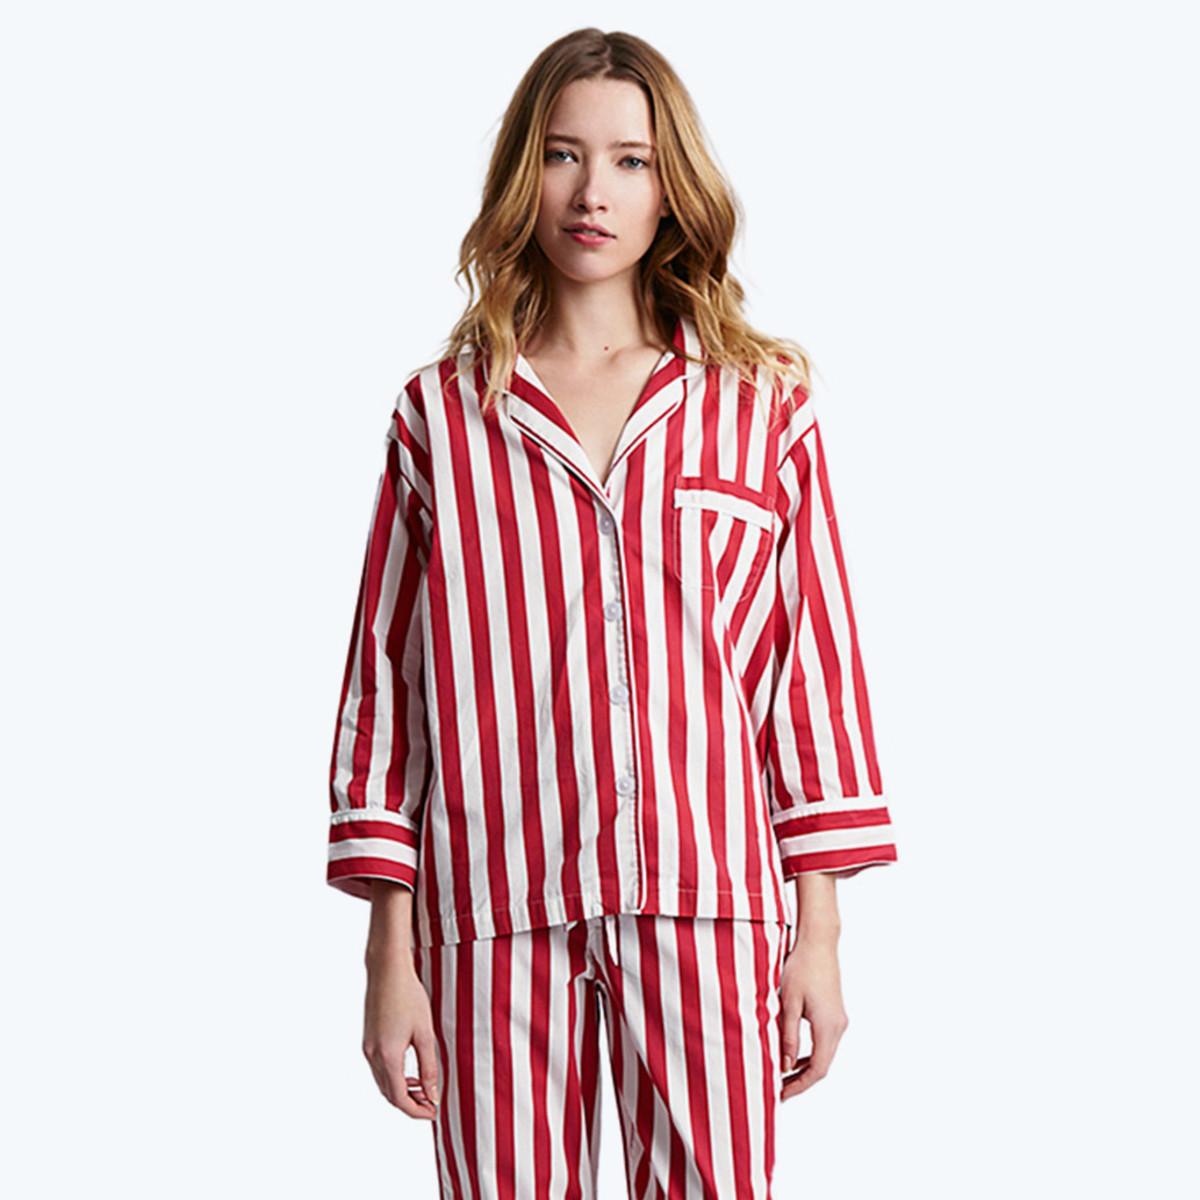 Sleepy Jones tent stripe pajama shirt, $148, available at Sleepy Jones; Sleepy Jones tent stripe pajama pant, $128, available at Sleepy Jones.